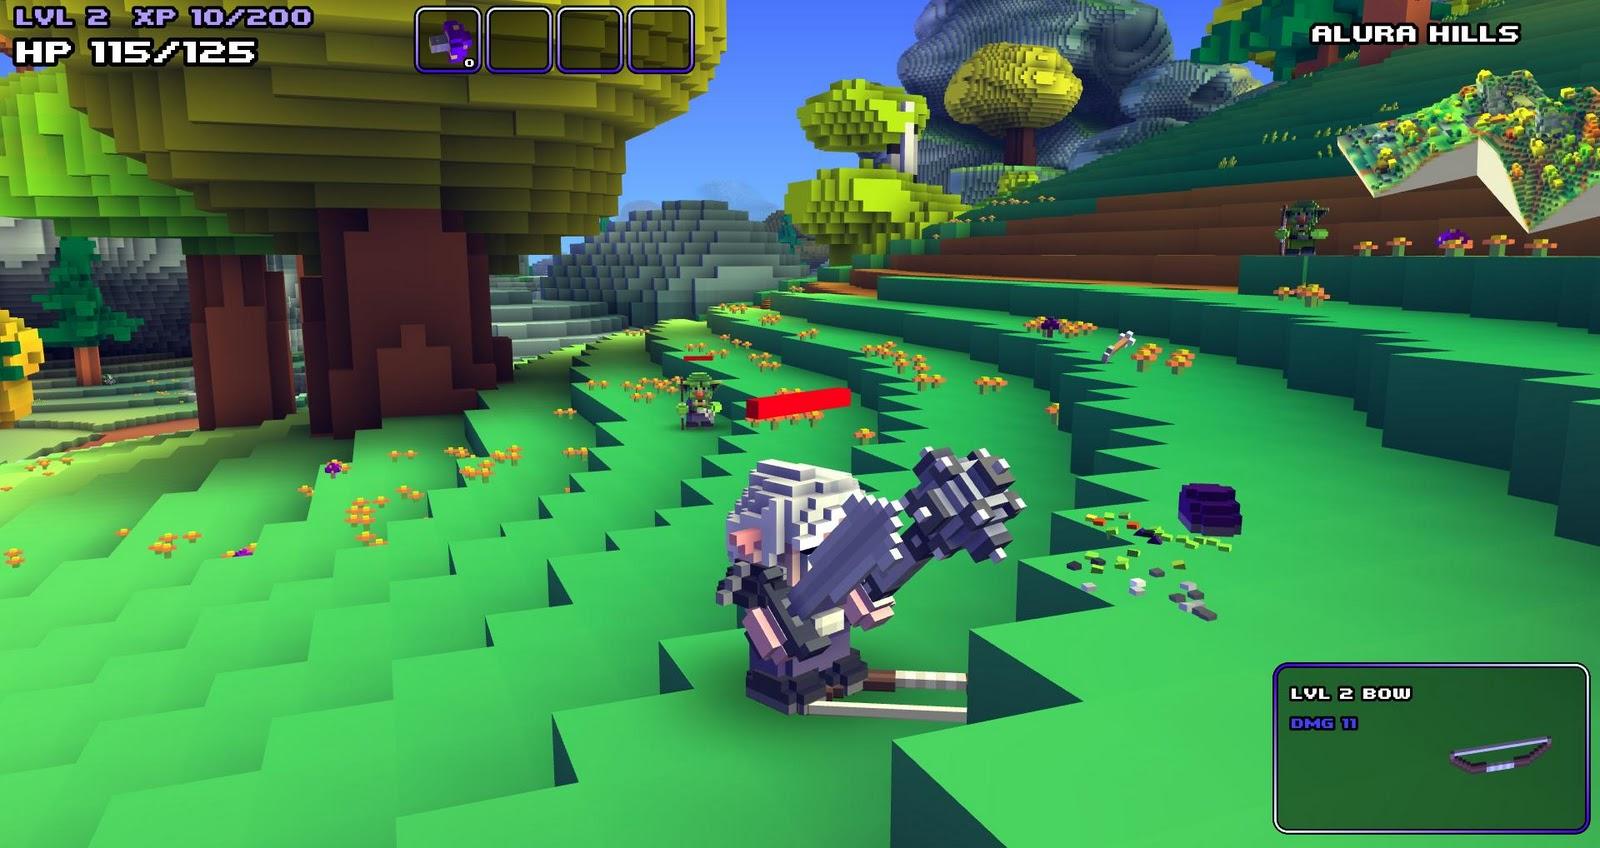 Cube 2011-12-03 17-23-33-66.jpg